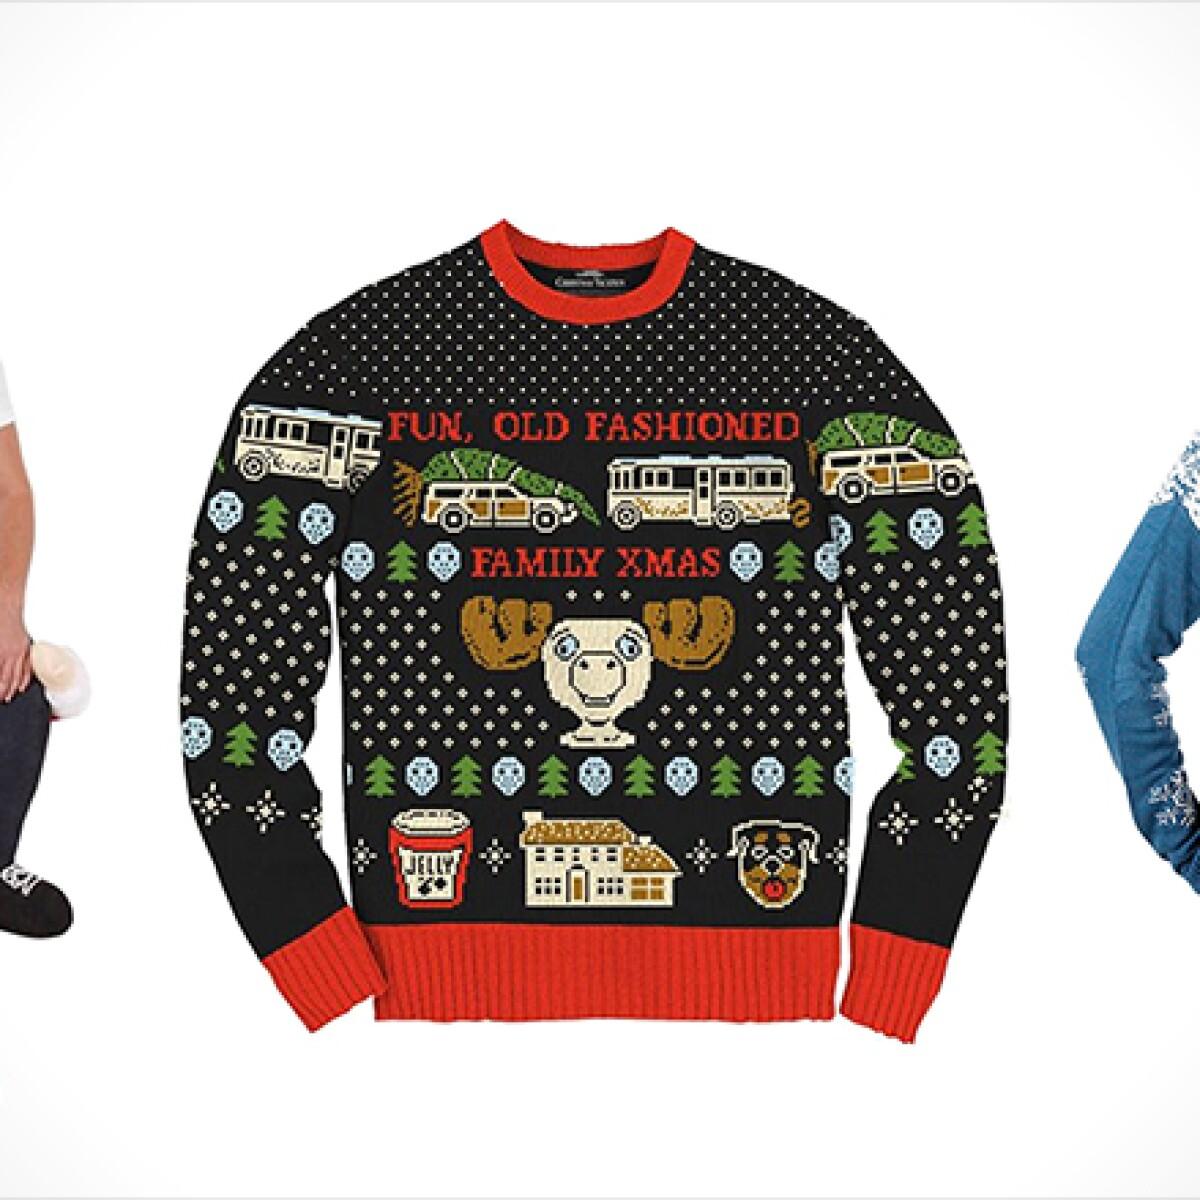 Ugly Christmas Sweater Sweatshirt Snoopy Charlie Brown The